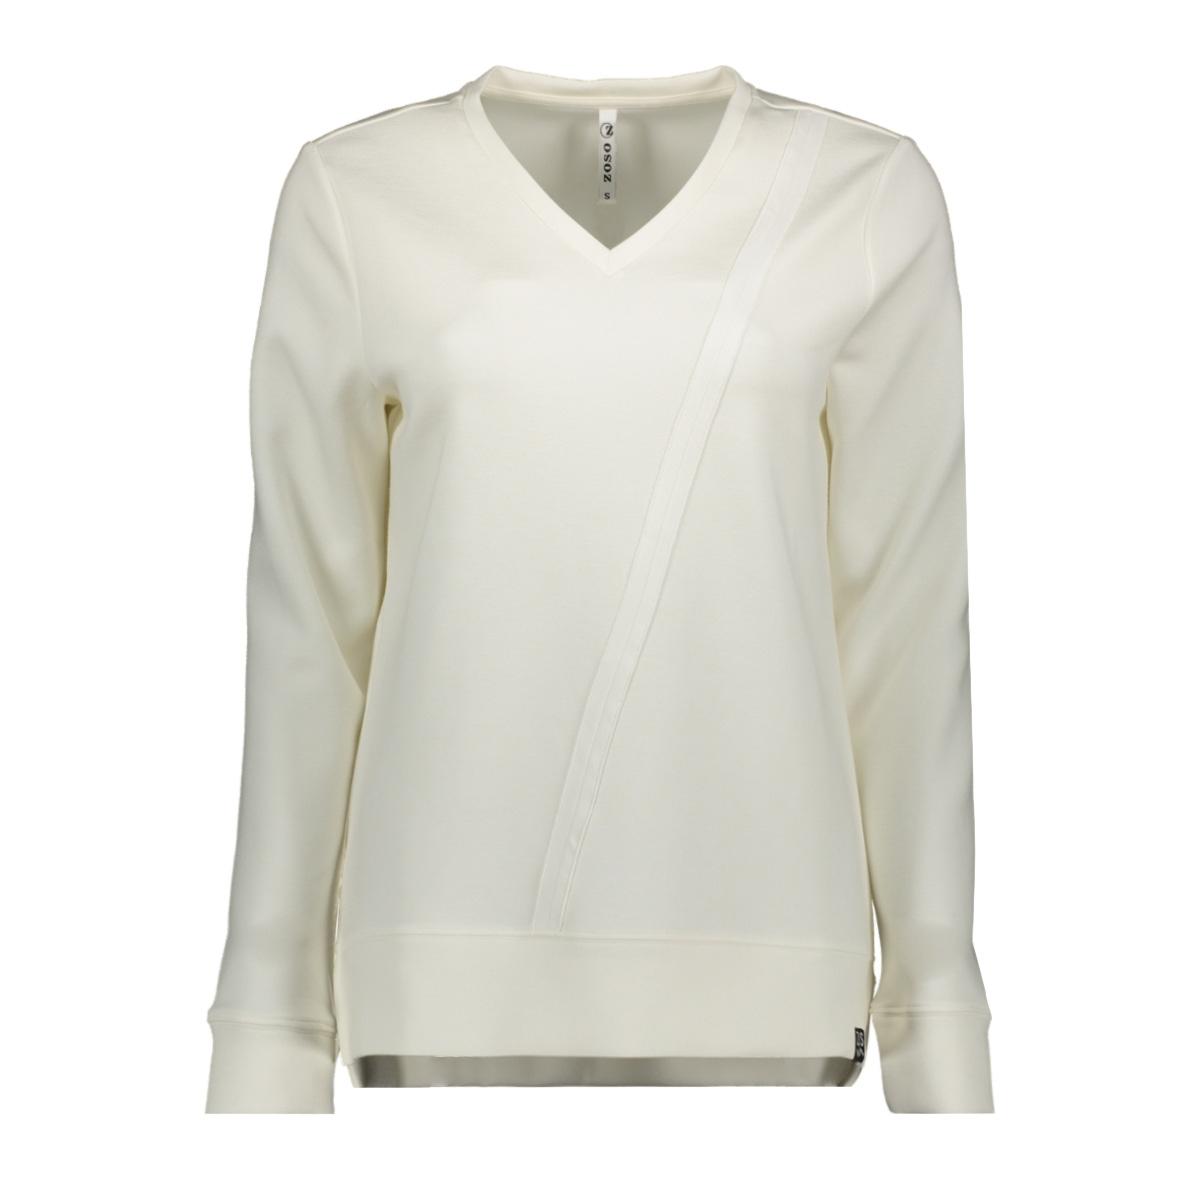 195 happy luxury fabric sweater zoso sweater off white